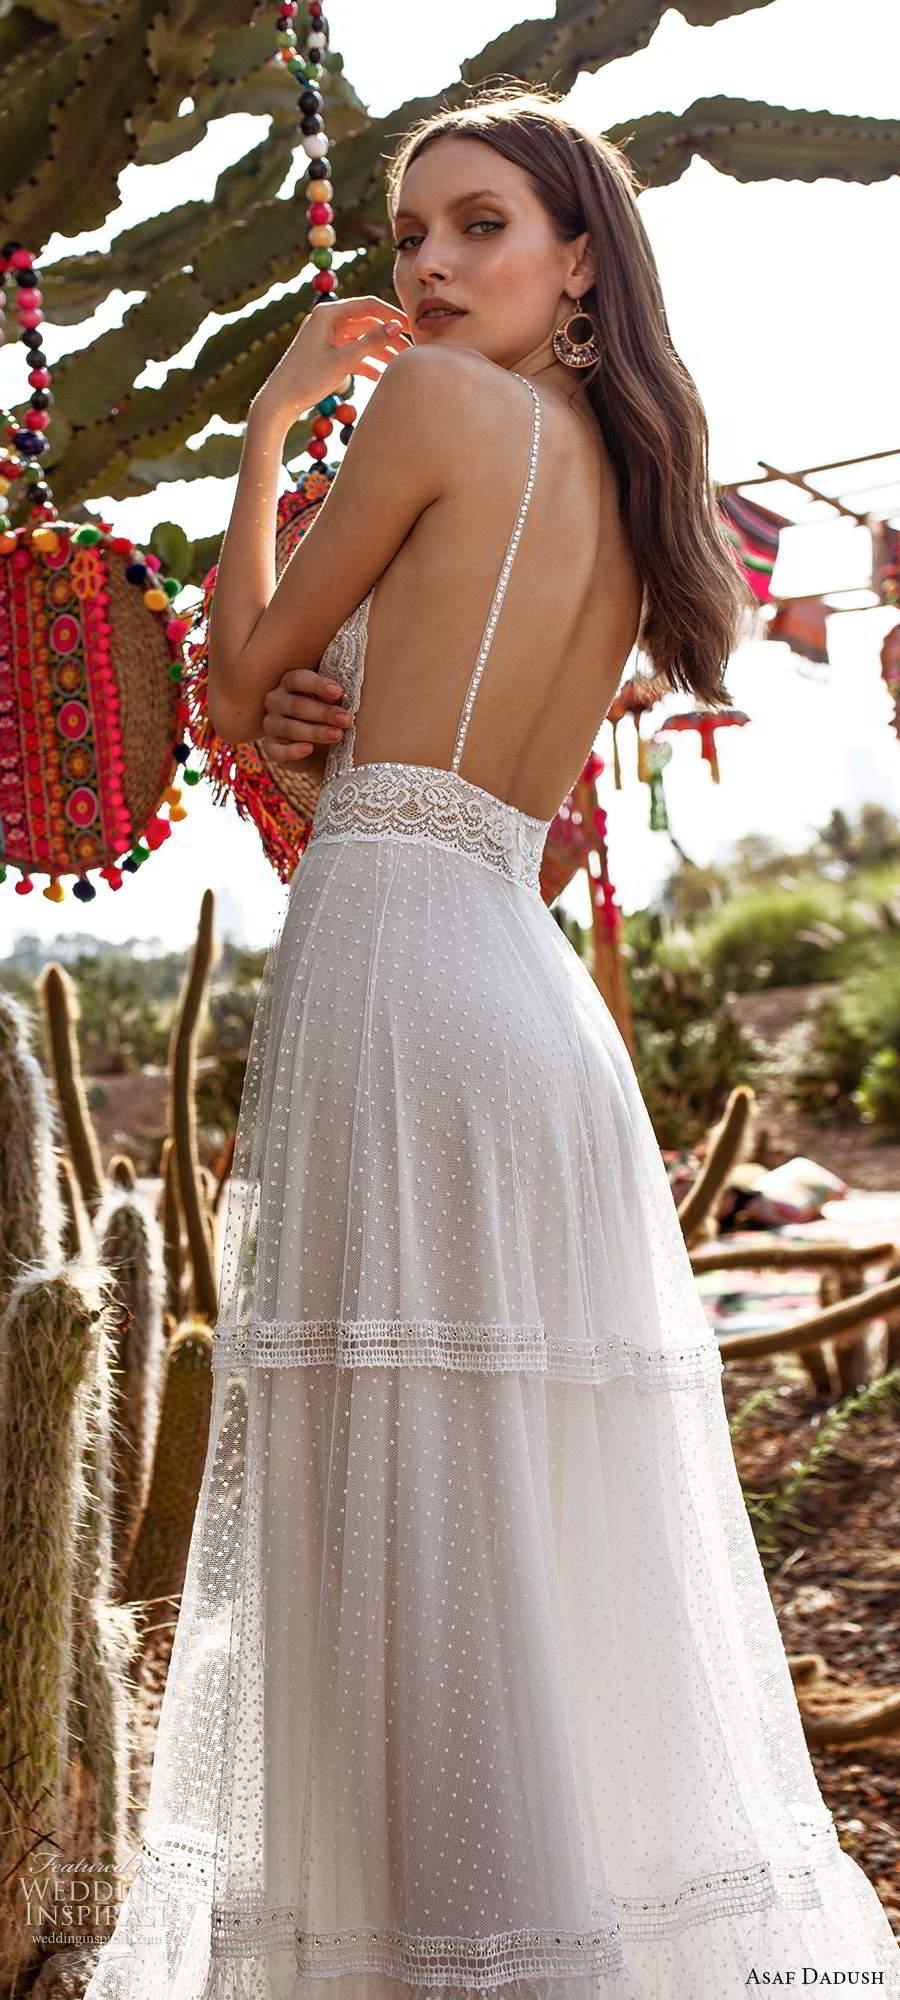 asaf dadush 2020 bridal sleeveless thin beaded straps sweetheart neckline fully embellished a line wedding dress low back (6) zbv